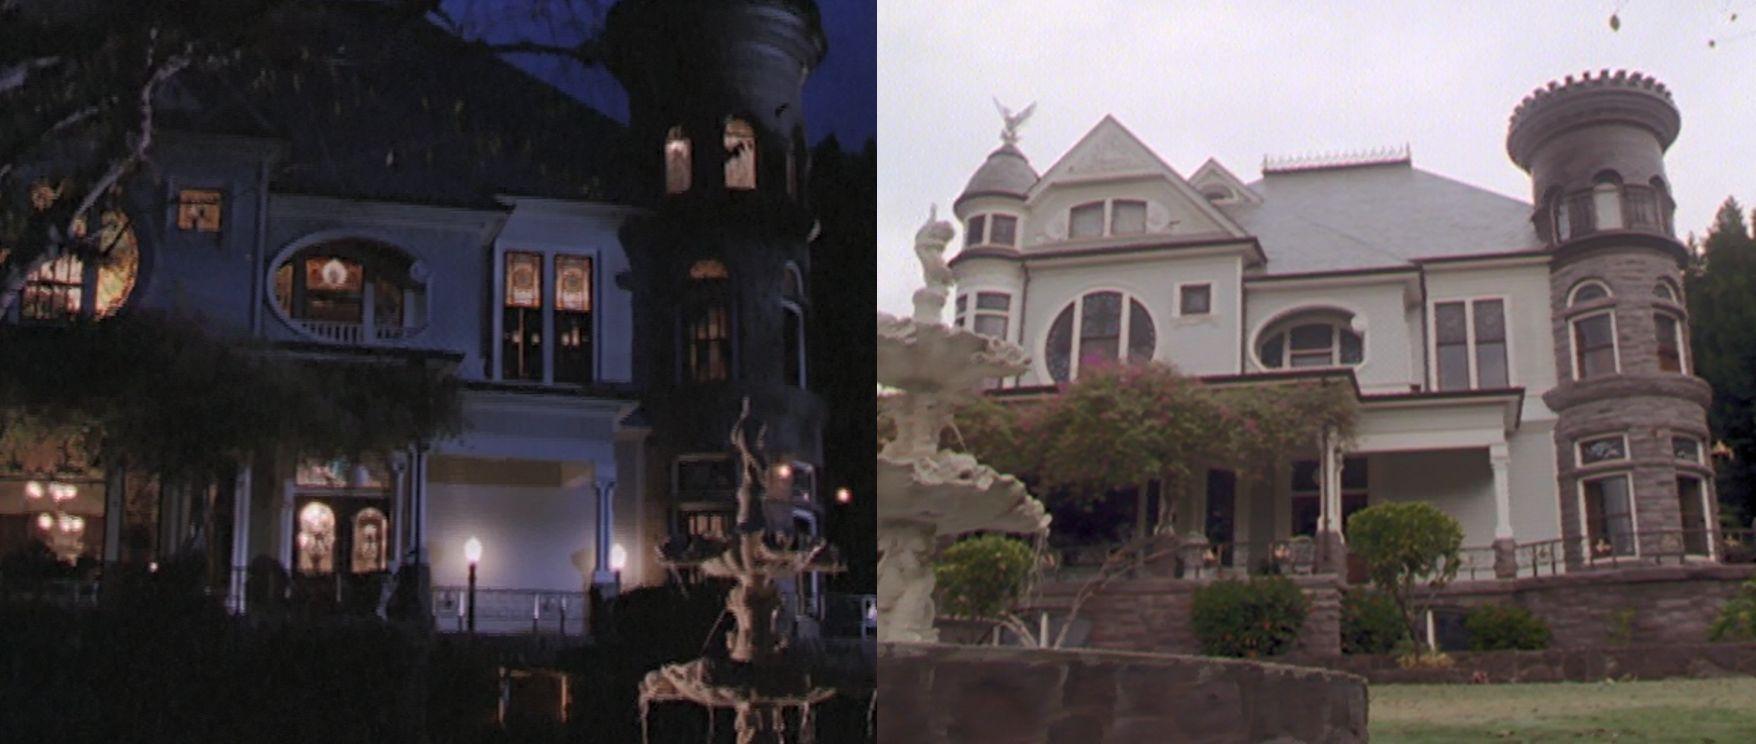 casas de embrujadas tía gail